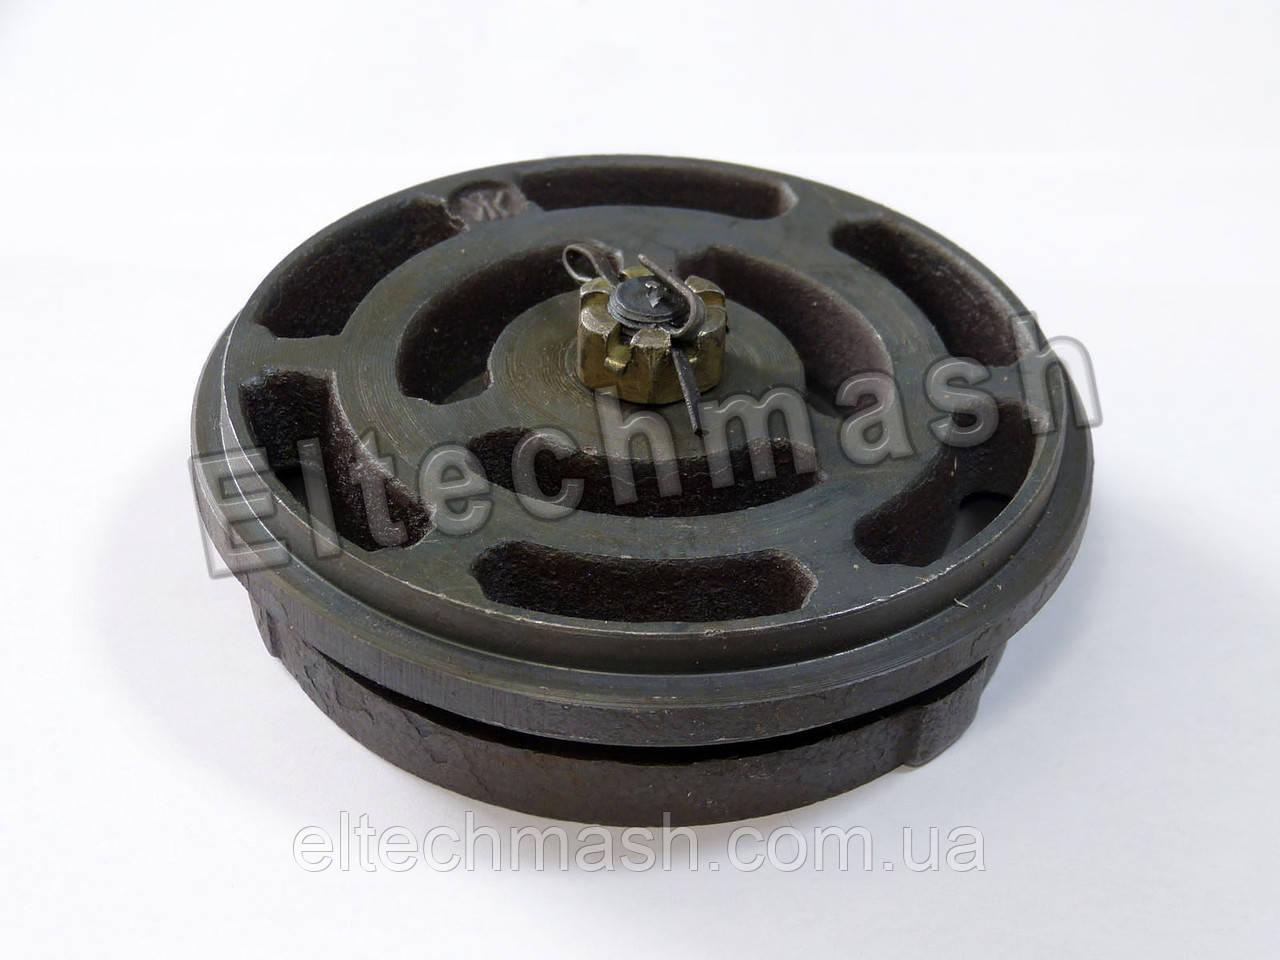 Клапан всасывающий КТ6.06.002СБ (34.06.02.00-010сб, КТ6-02сб) к компрессорам КТ6, КТ7